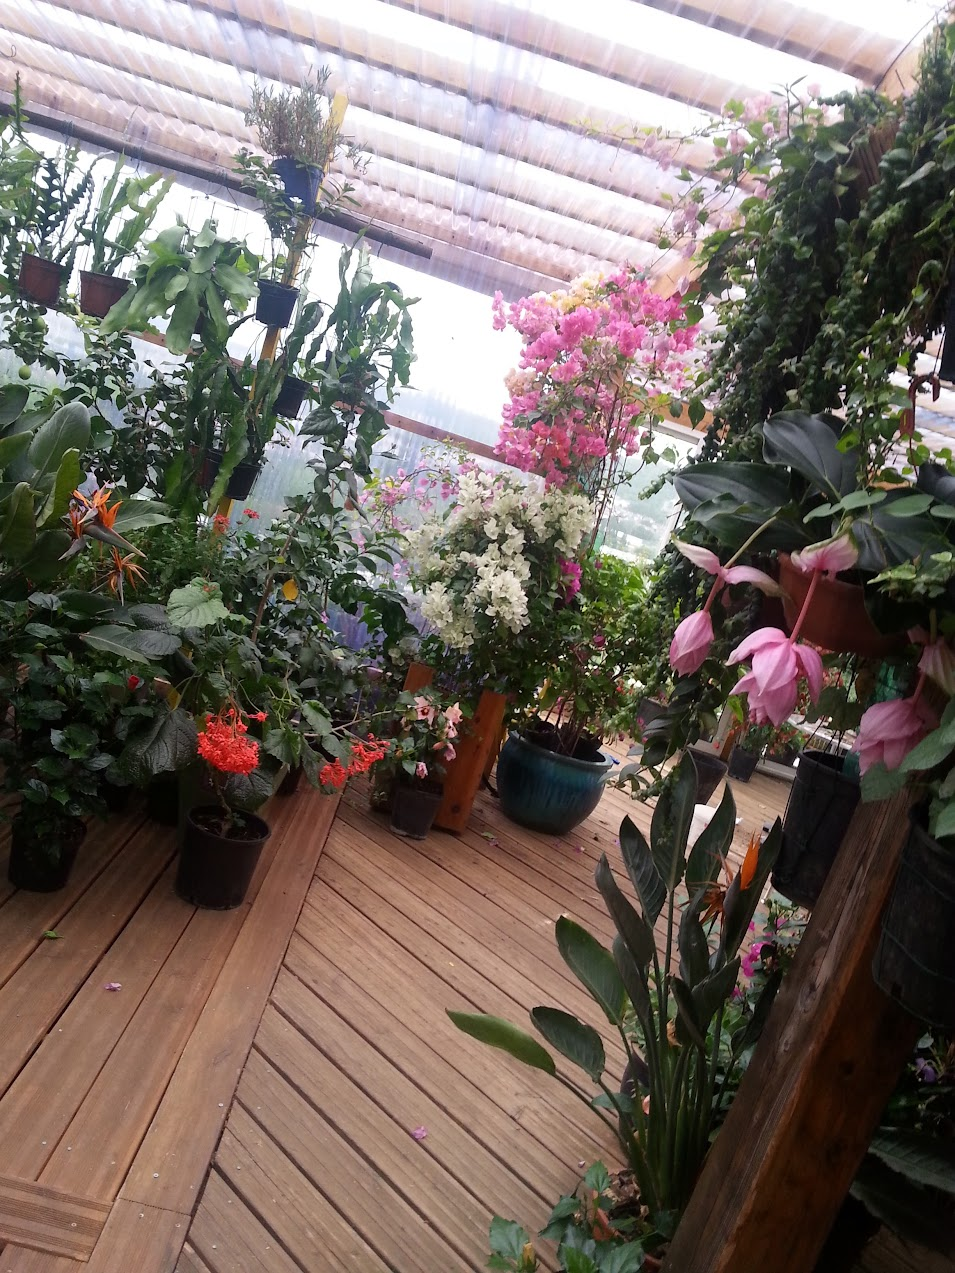 floraisons du mois - Page 26 LNHXcDGJvYzCA3OIrKXA_oHhJUiUmsVf1pmjaCDJfh3H=w955-h1273-no